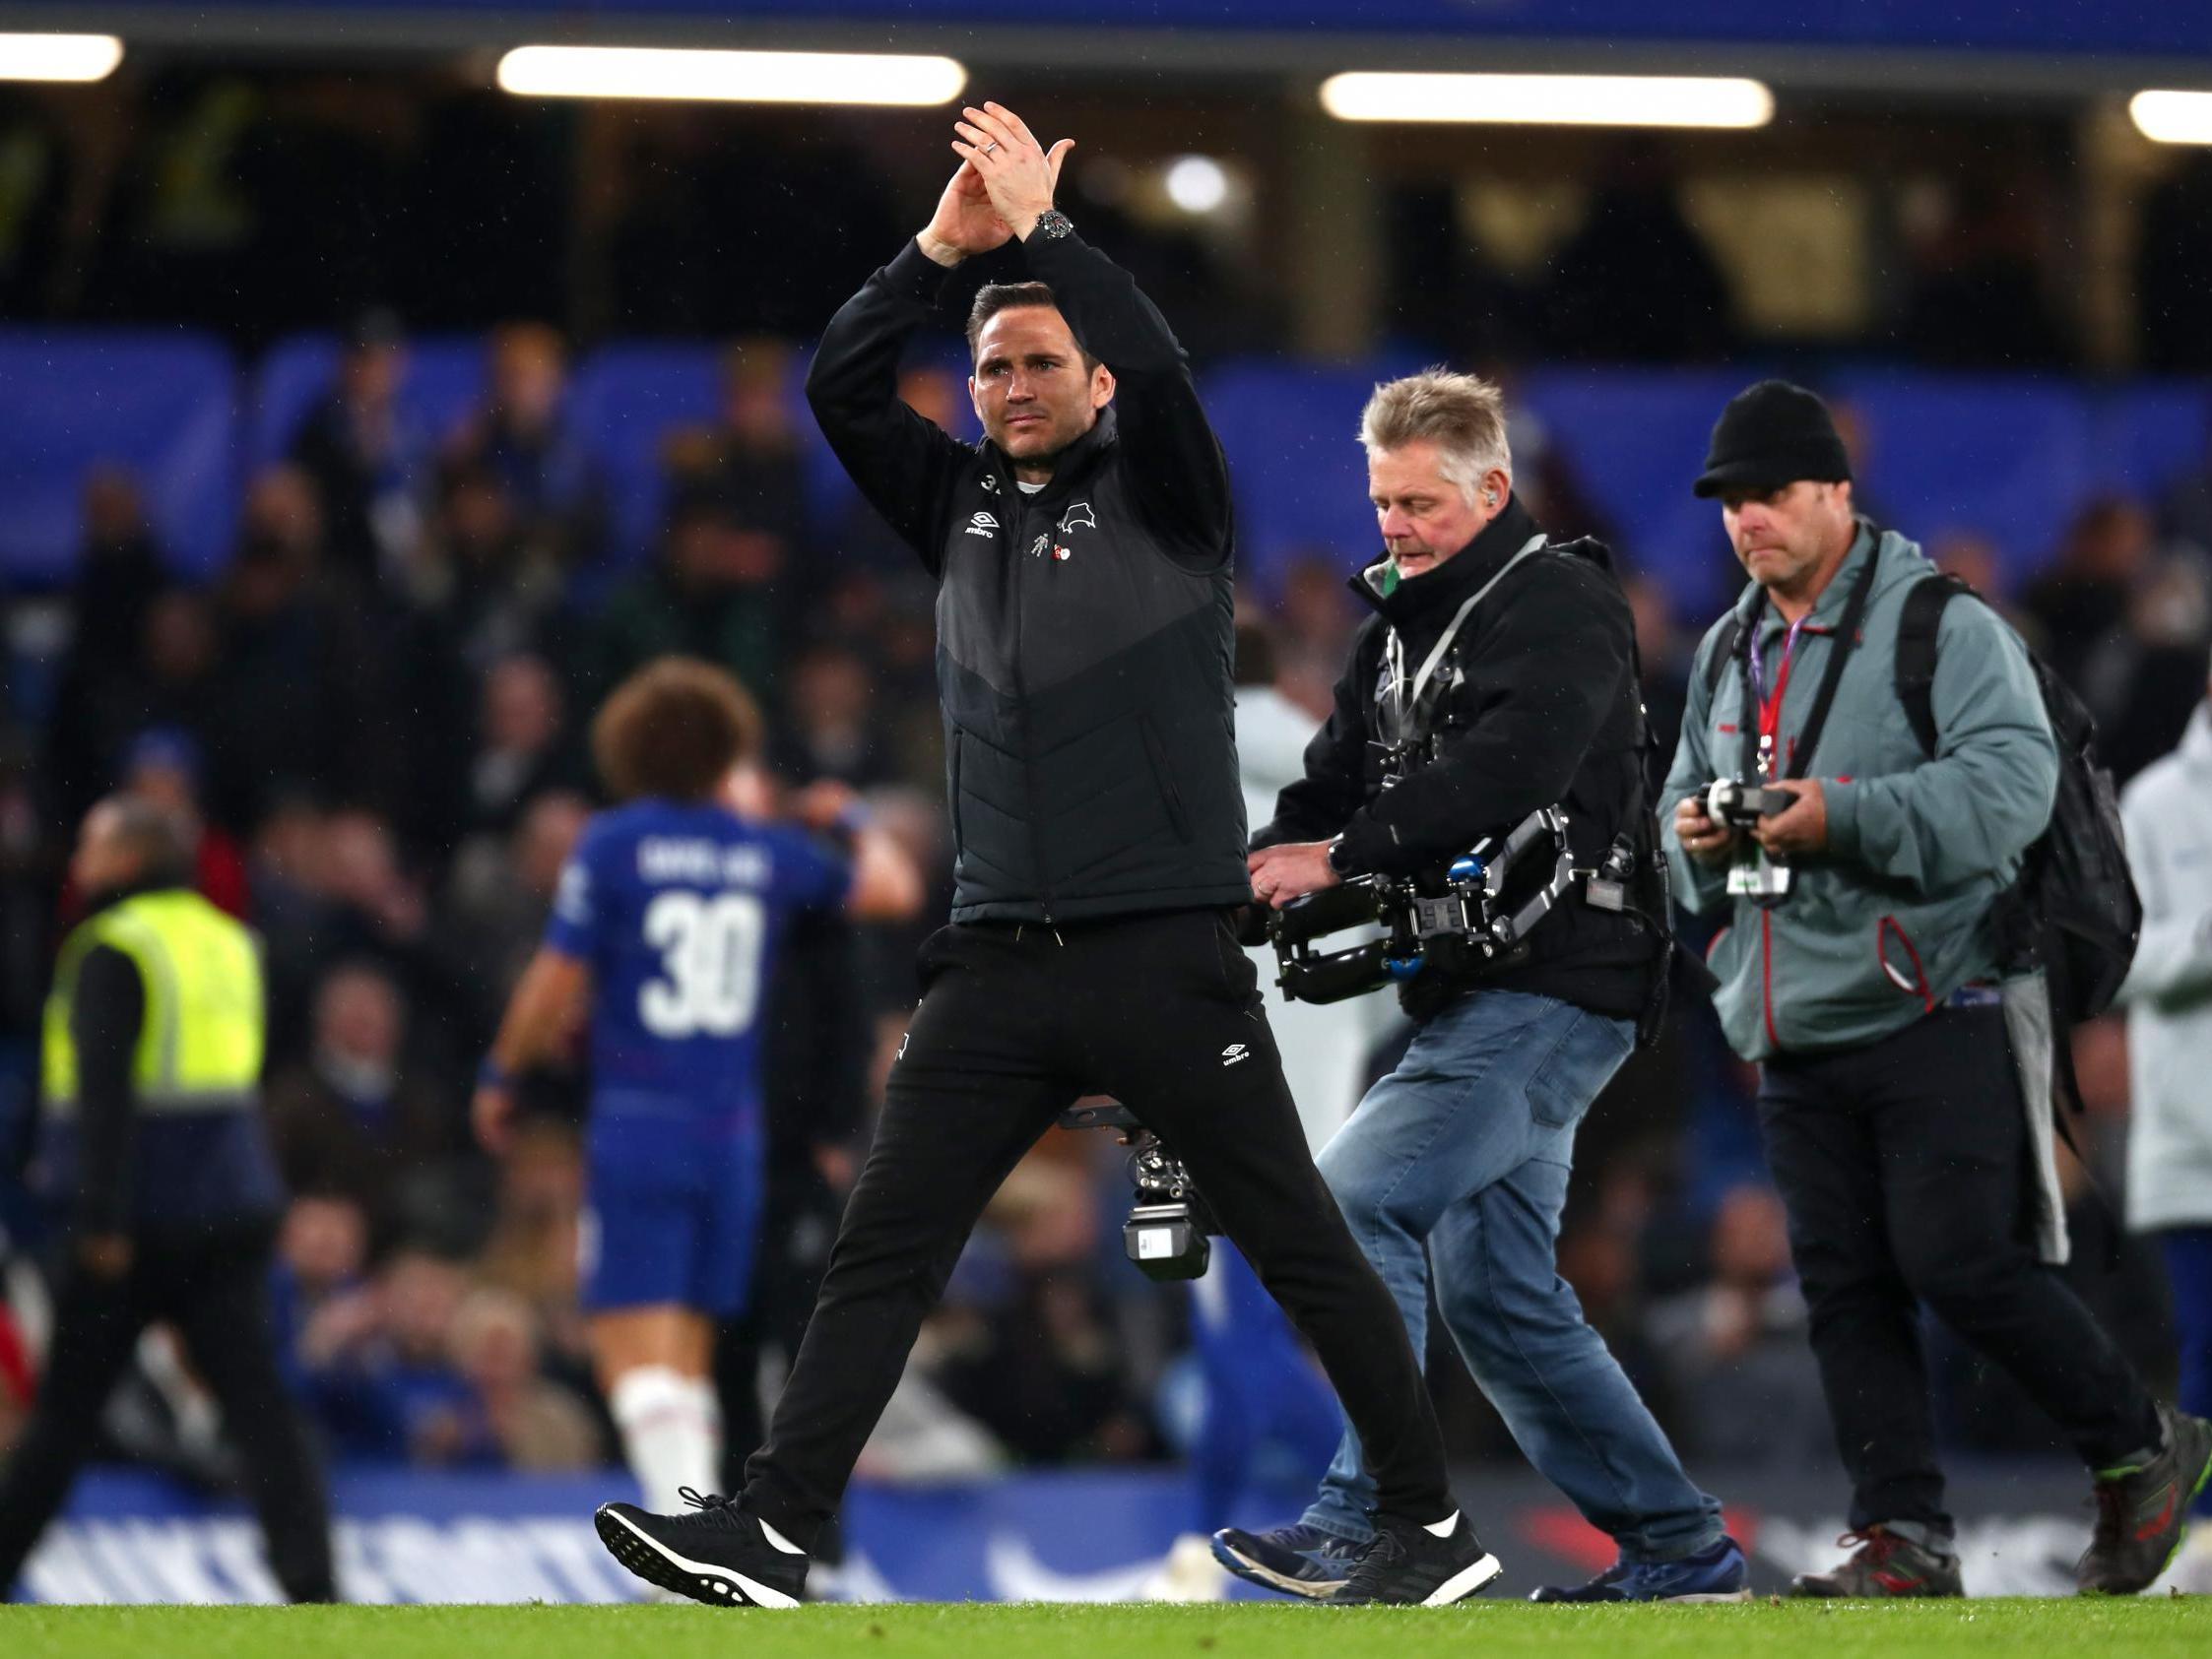 Chelsea vs Derby: On his return dwelling, Frank Lampard confirmed